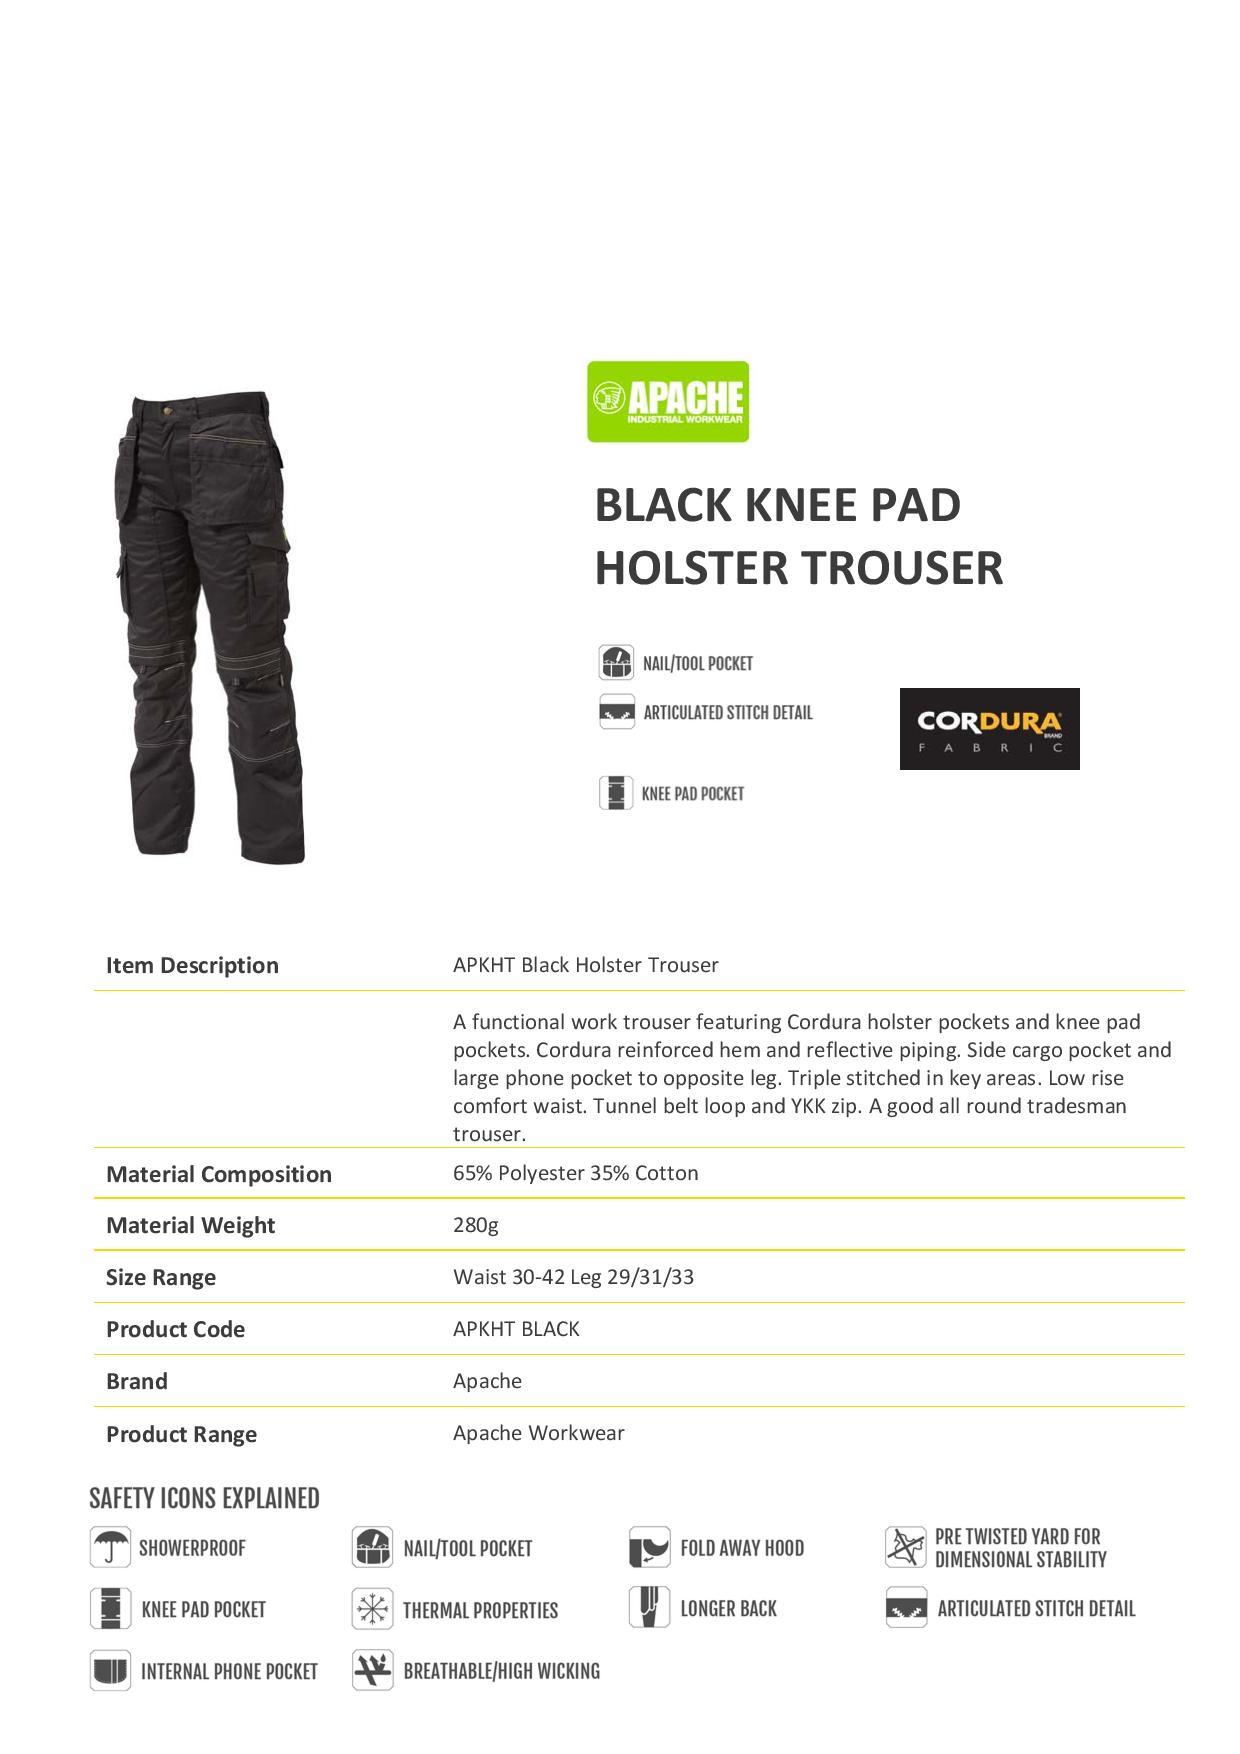 6e9ff007bc413 Apache Black Knee Pad Holster Trouser - 280g - Short Leg 29